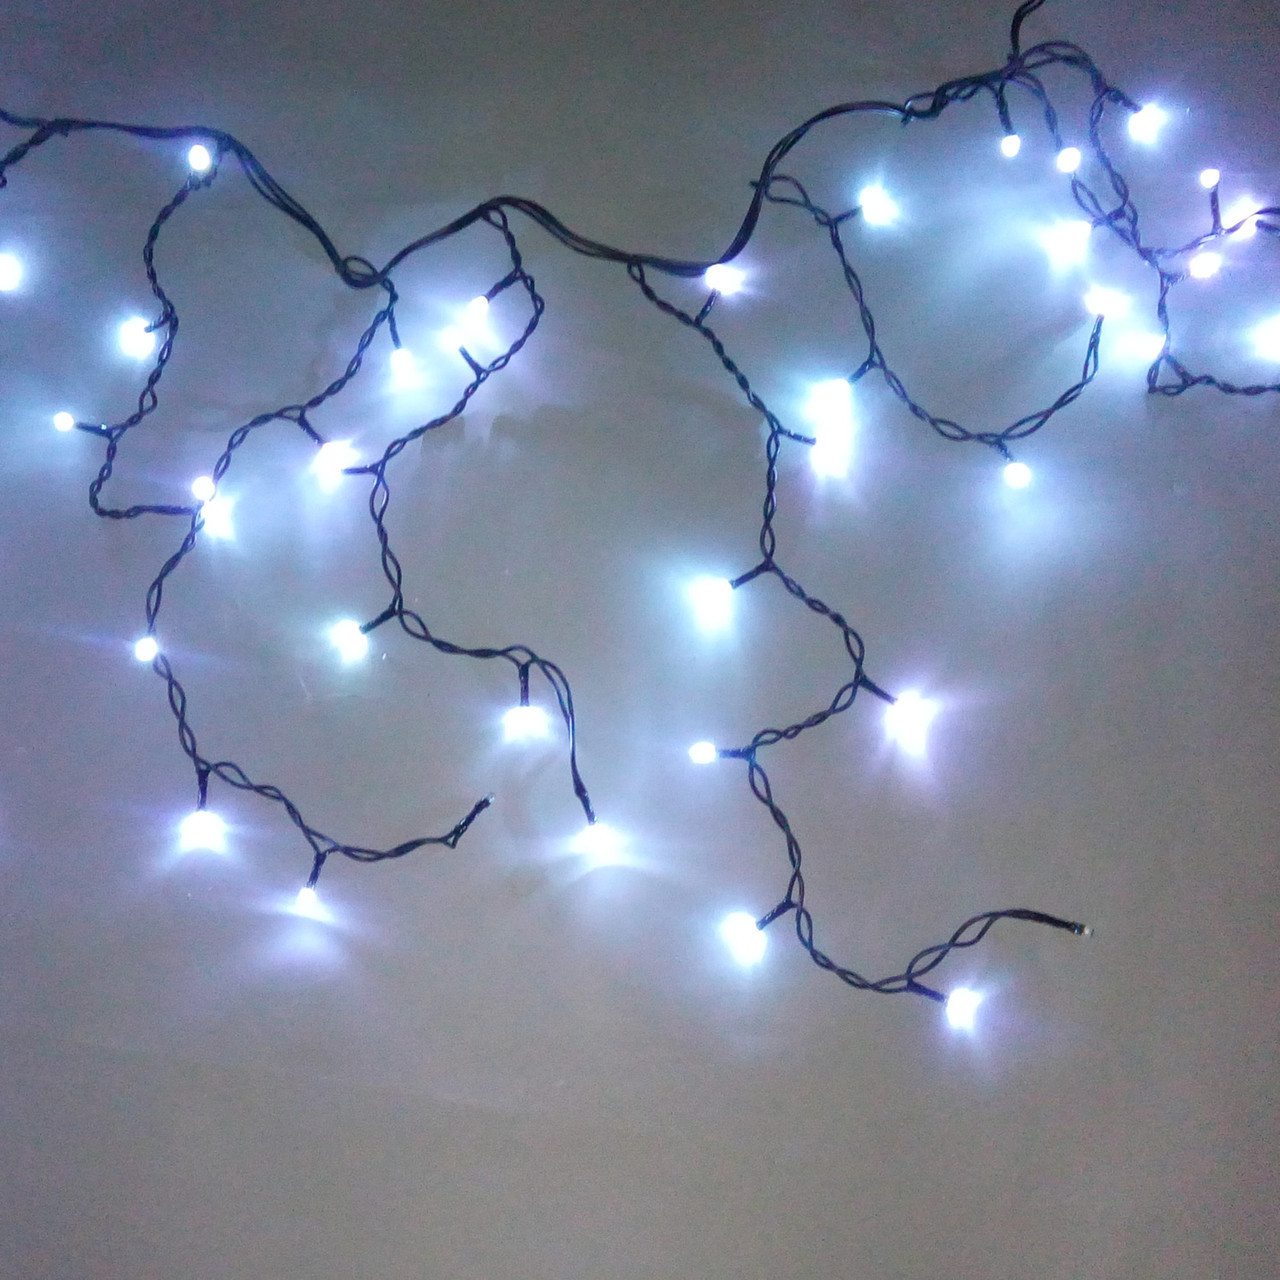 Светодиодная гирлянда Бахрома Flash, 3х0.6 м, 2,2мм Синий/Черный Каучук